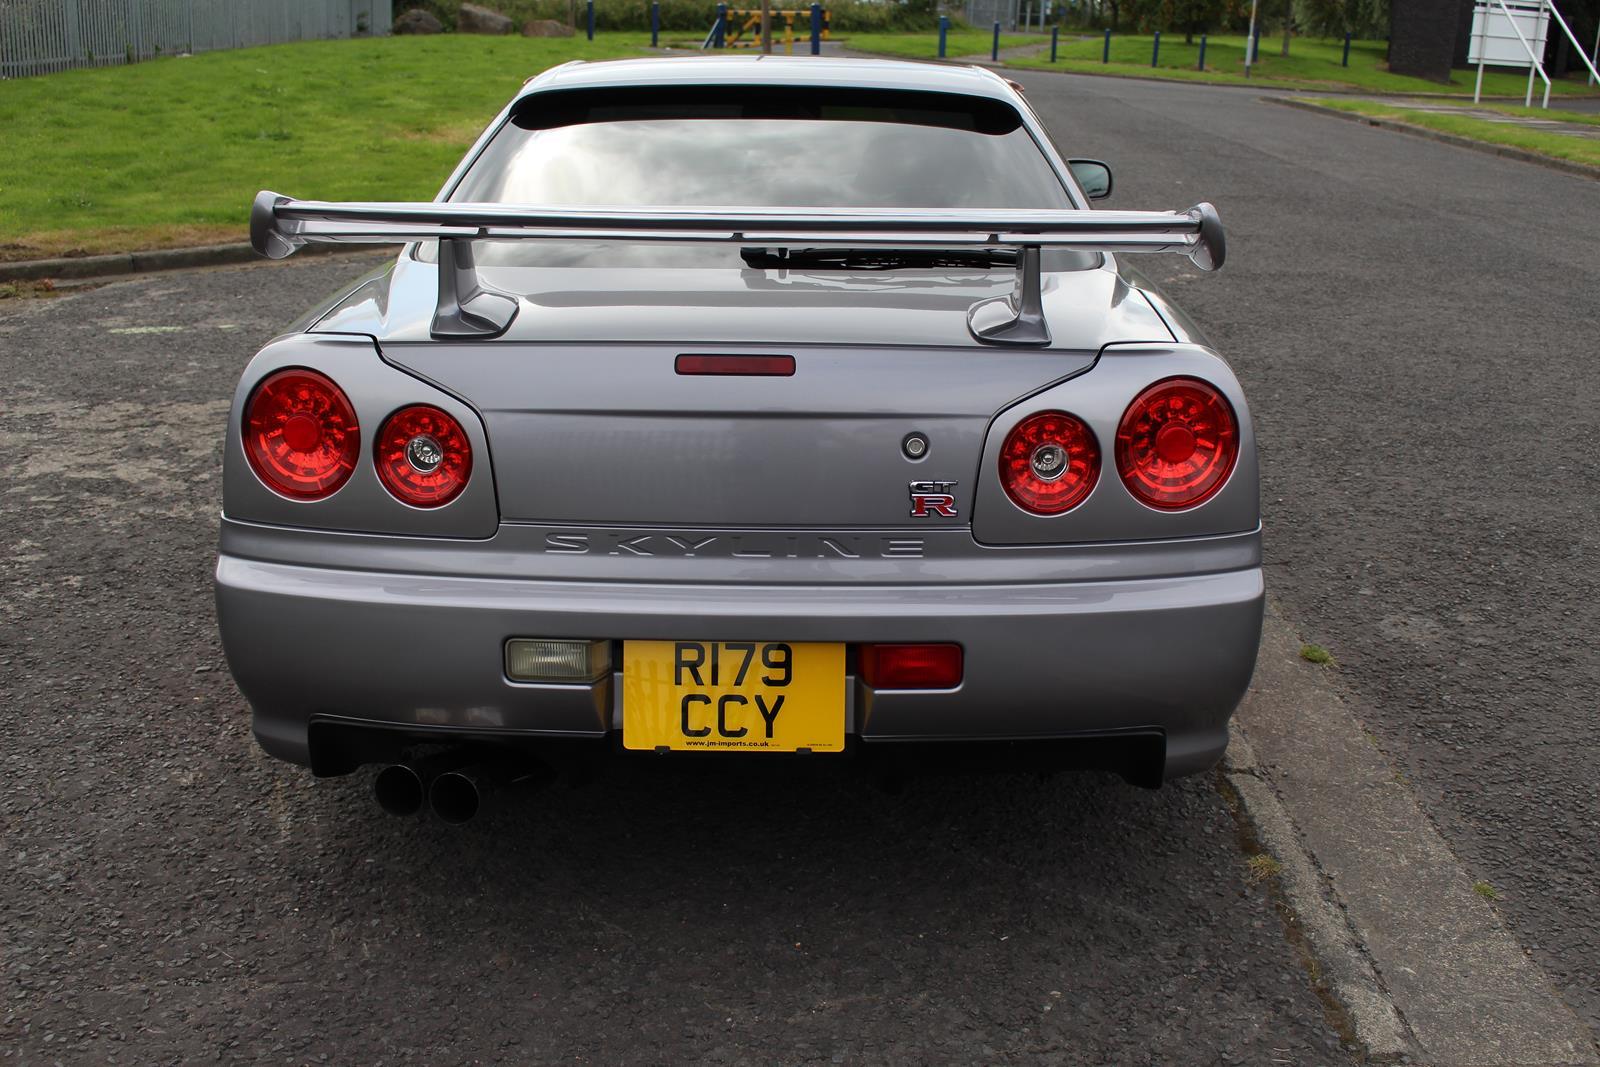 Nissan Skyline Gtr For Sale >> 1998 Nissan Skyline R34 GT-T 400PS GTR Front - JM-Imports